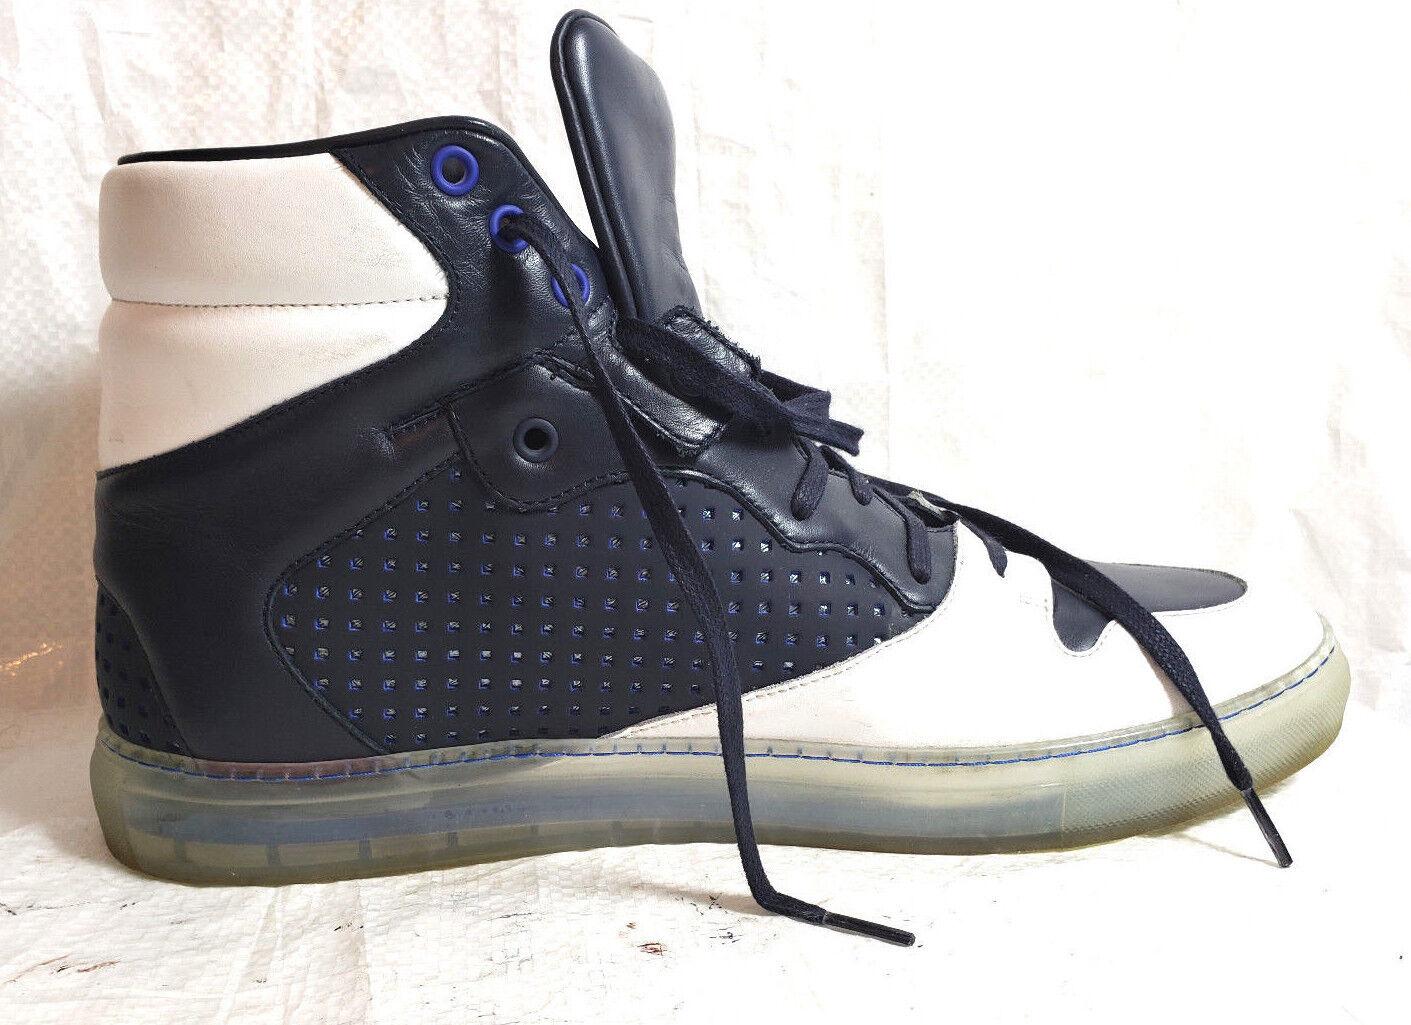 411dd0e2593940 BALENCIAGA Uomo High Top scarpe da ginnastica Pelle S. S. S. Gomme US 12 EU  46 blu bianca leather b05462